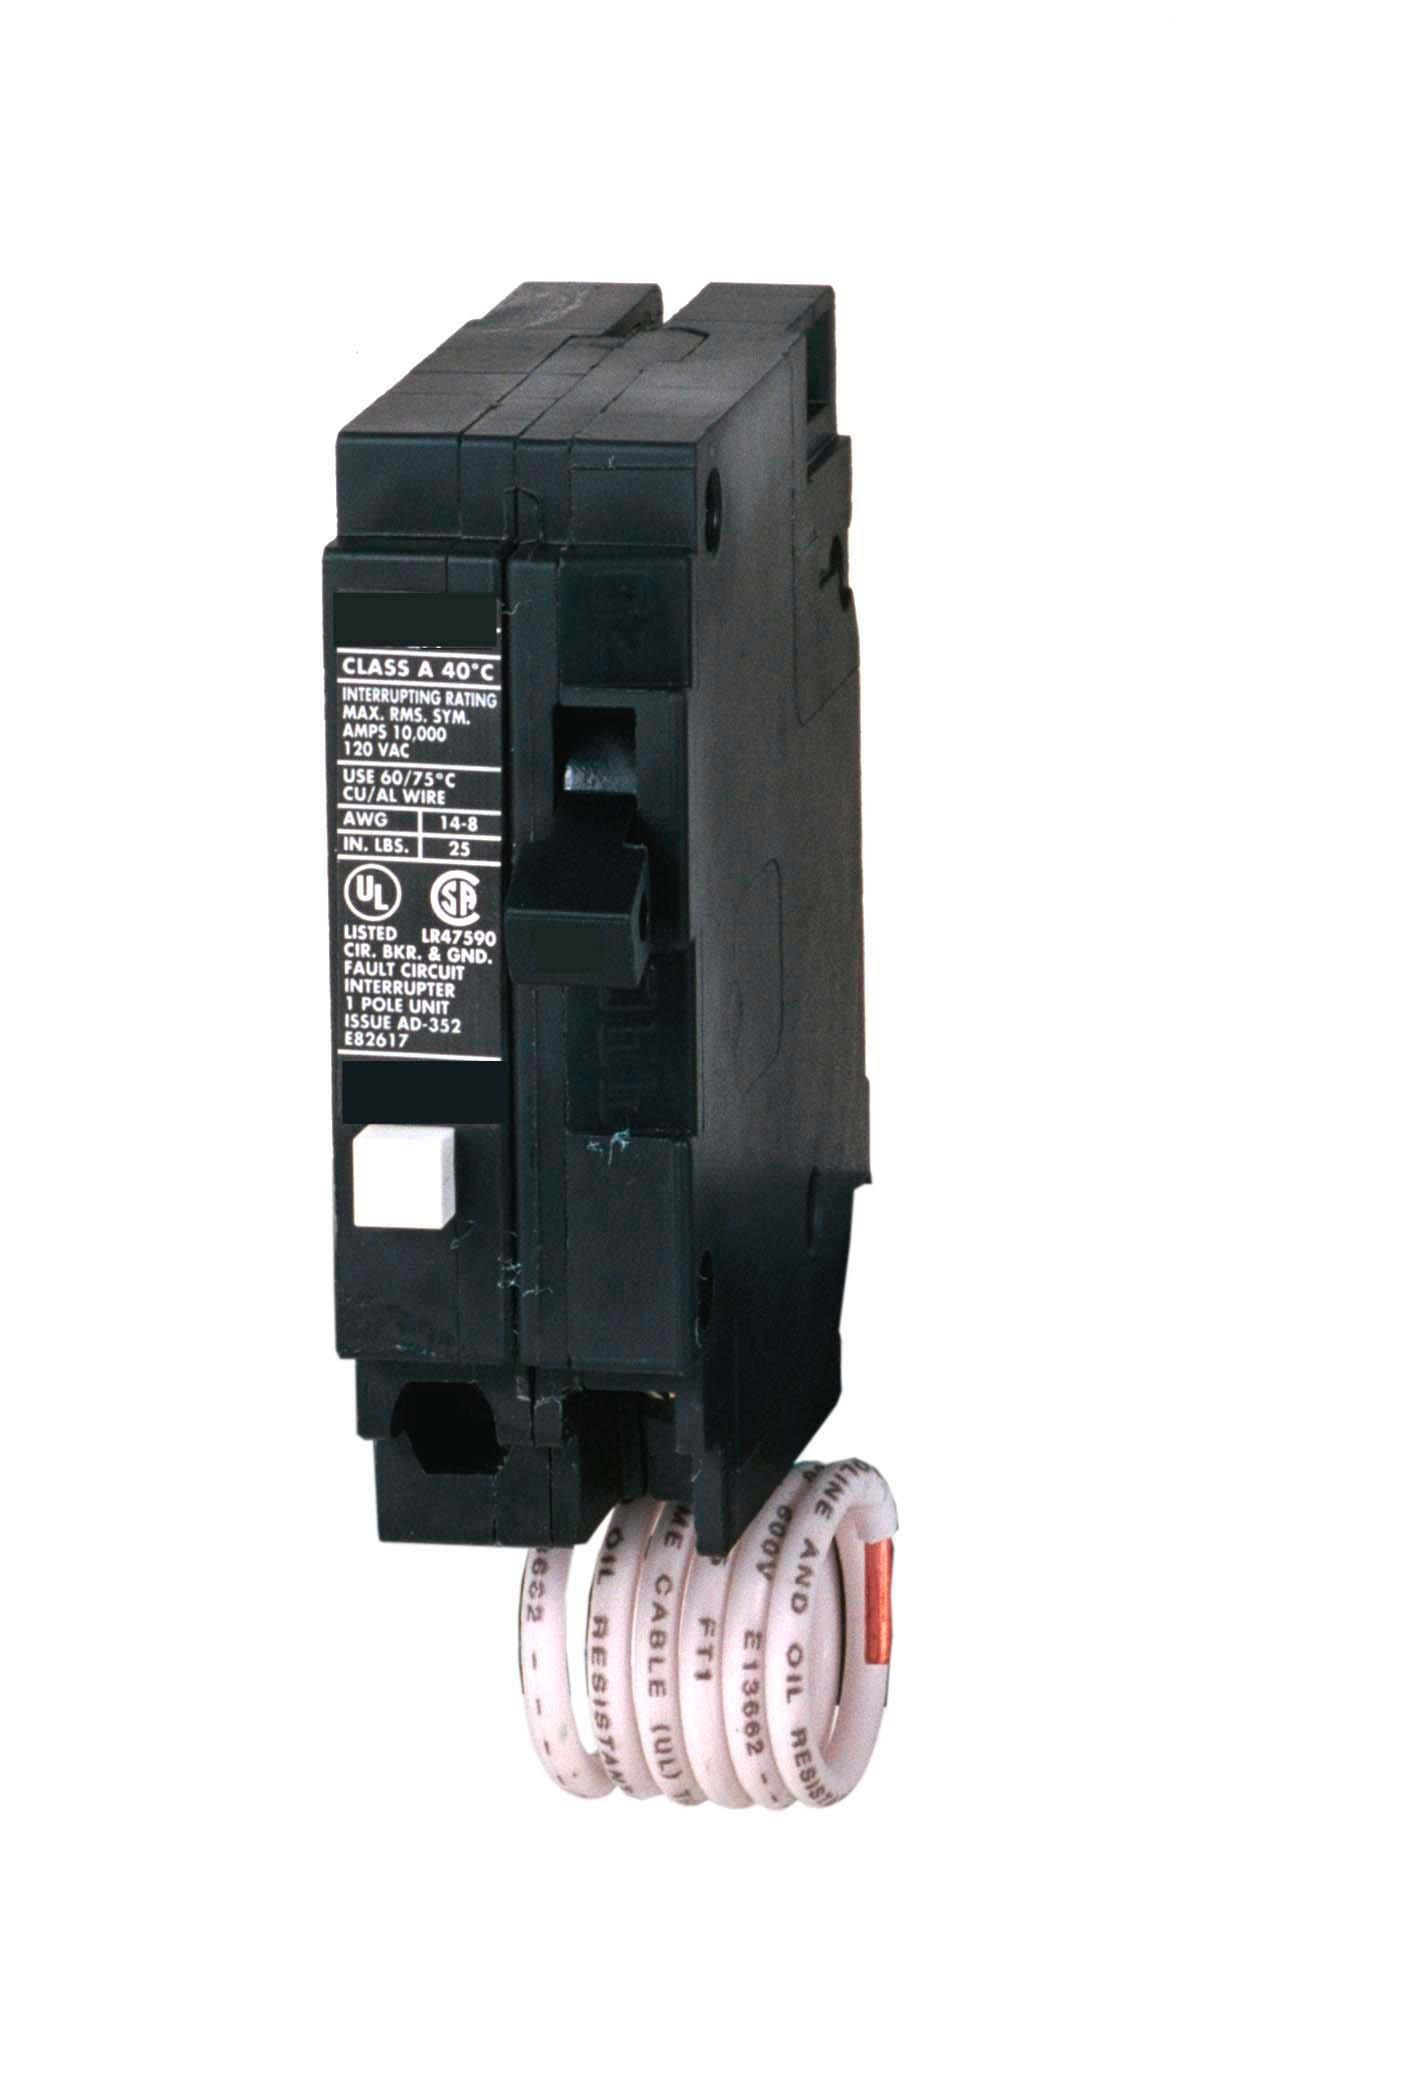 Murray MP120EG 20-Amp Single Pole 120-Volt Group Fault Equipment Protection Circuit Breaker